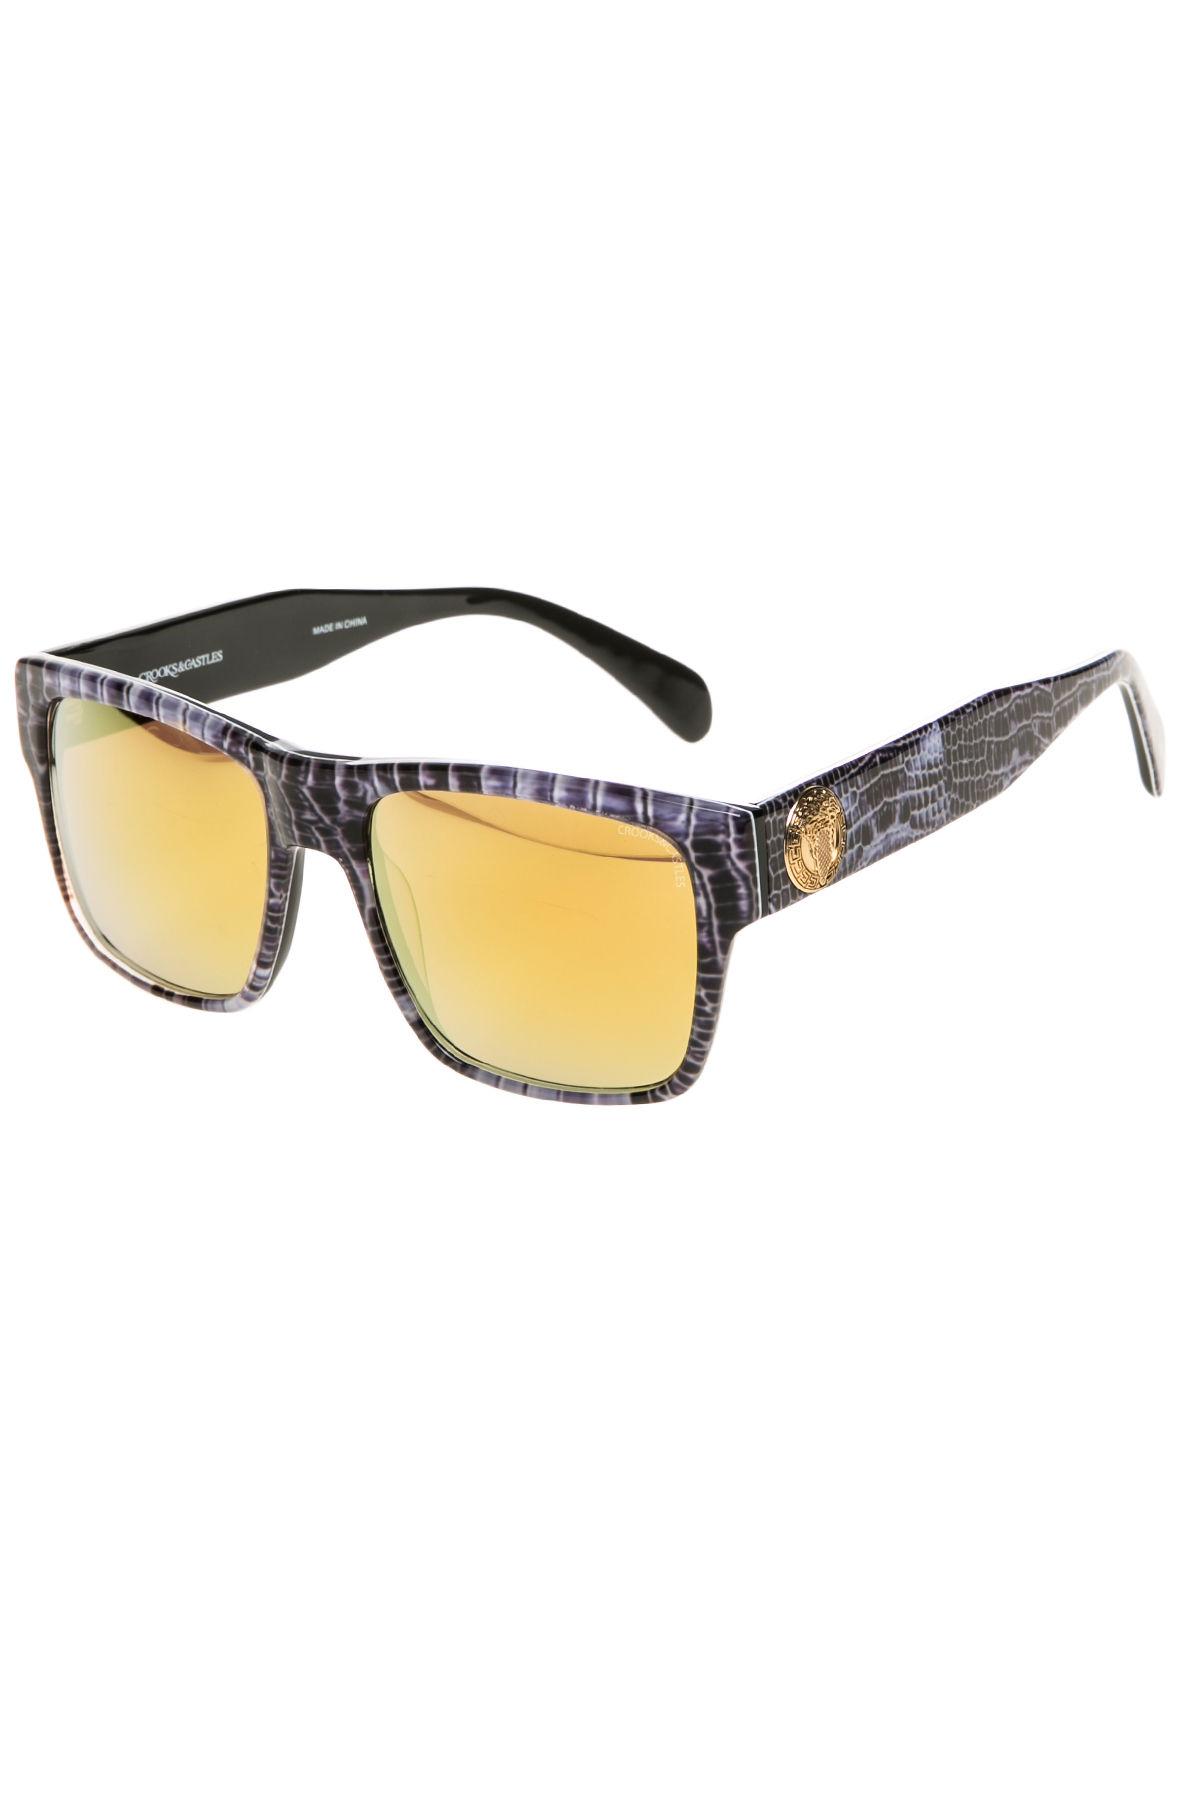 dbbcfec8da255 Lyst - Crooks and Castles The Violento Sunglasses in Yellow for Men